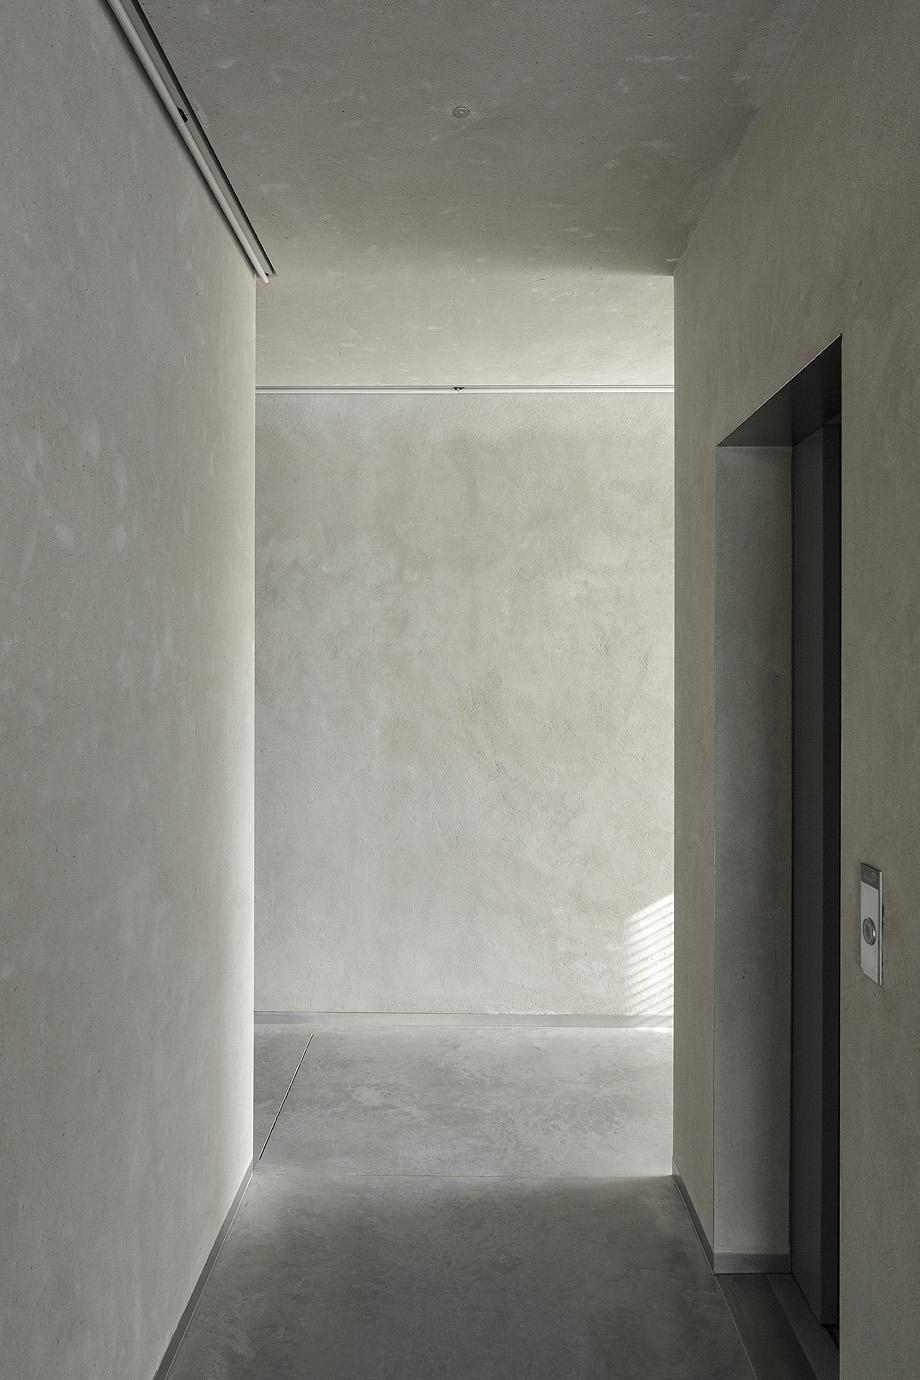 casa vle de ism architecten y paul ibens (10)